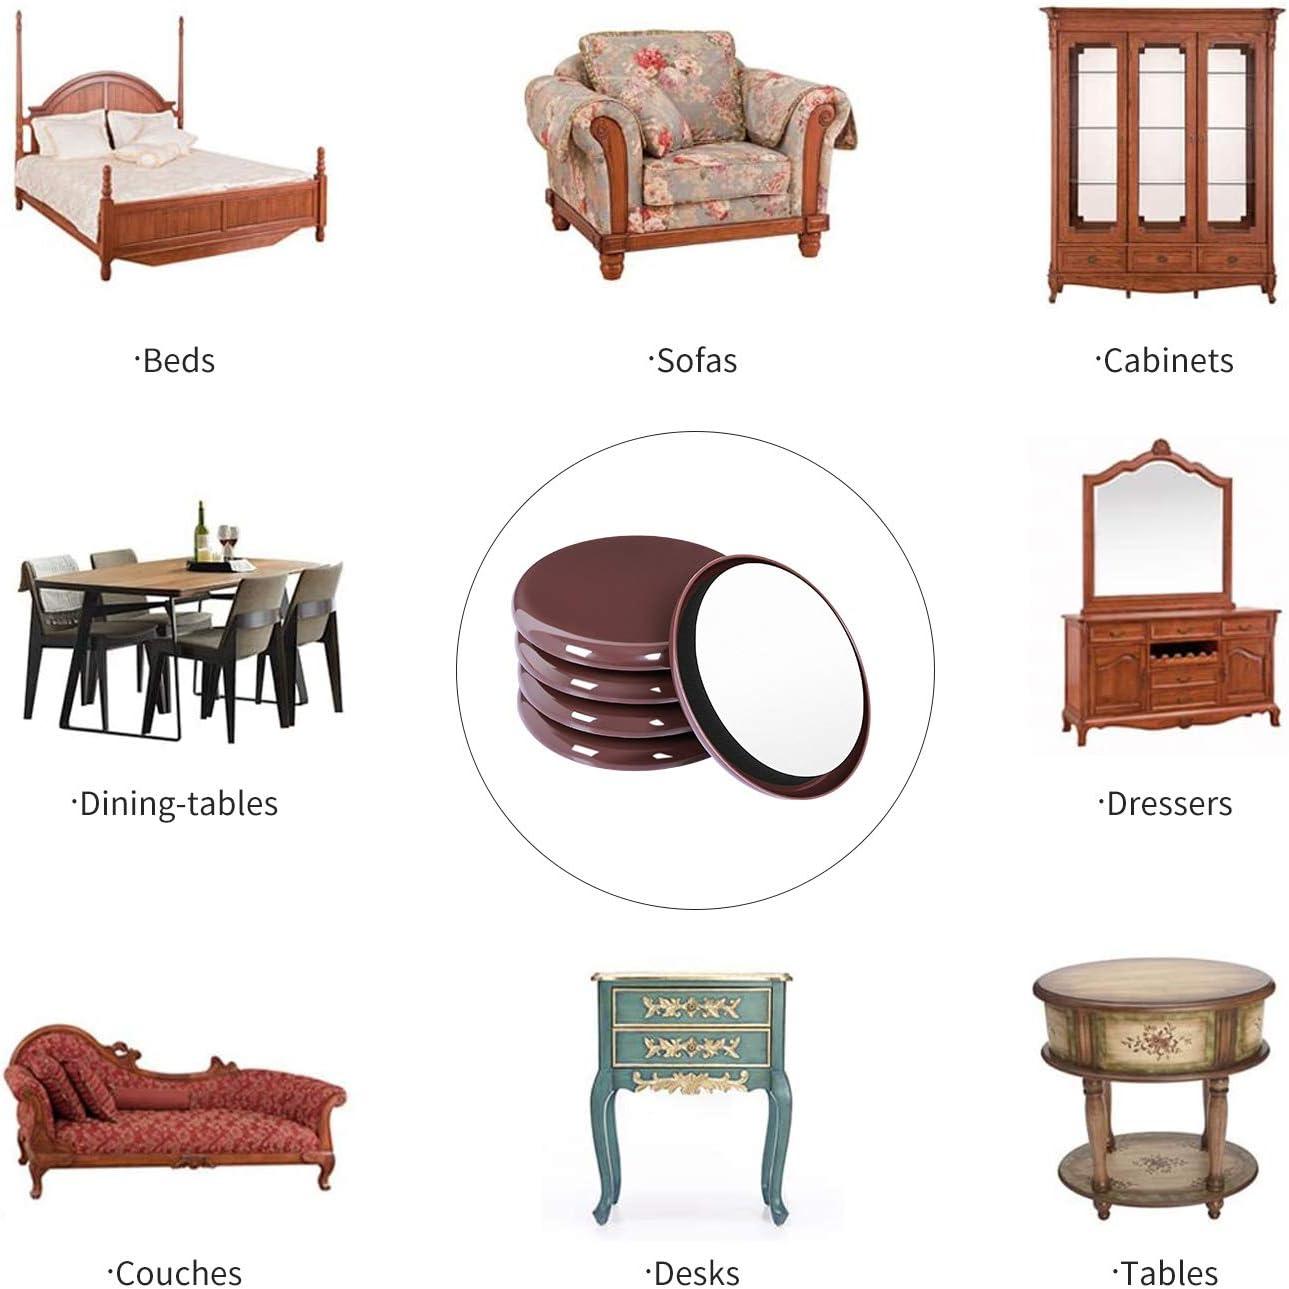 Brown Round,40 PCS Ezprotekt Furniture Sliders for Carpet Sliders 1-1//8 Inch for Moving Furniture Movers Carpet Gliders Glides Self-Adhesive Furniture Moving Pads